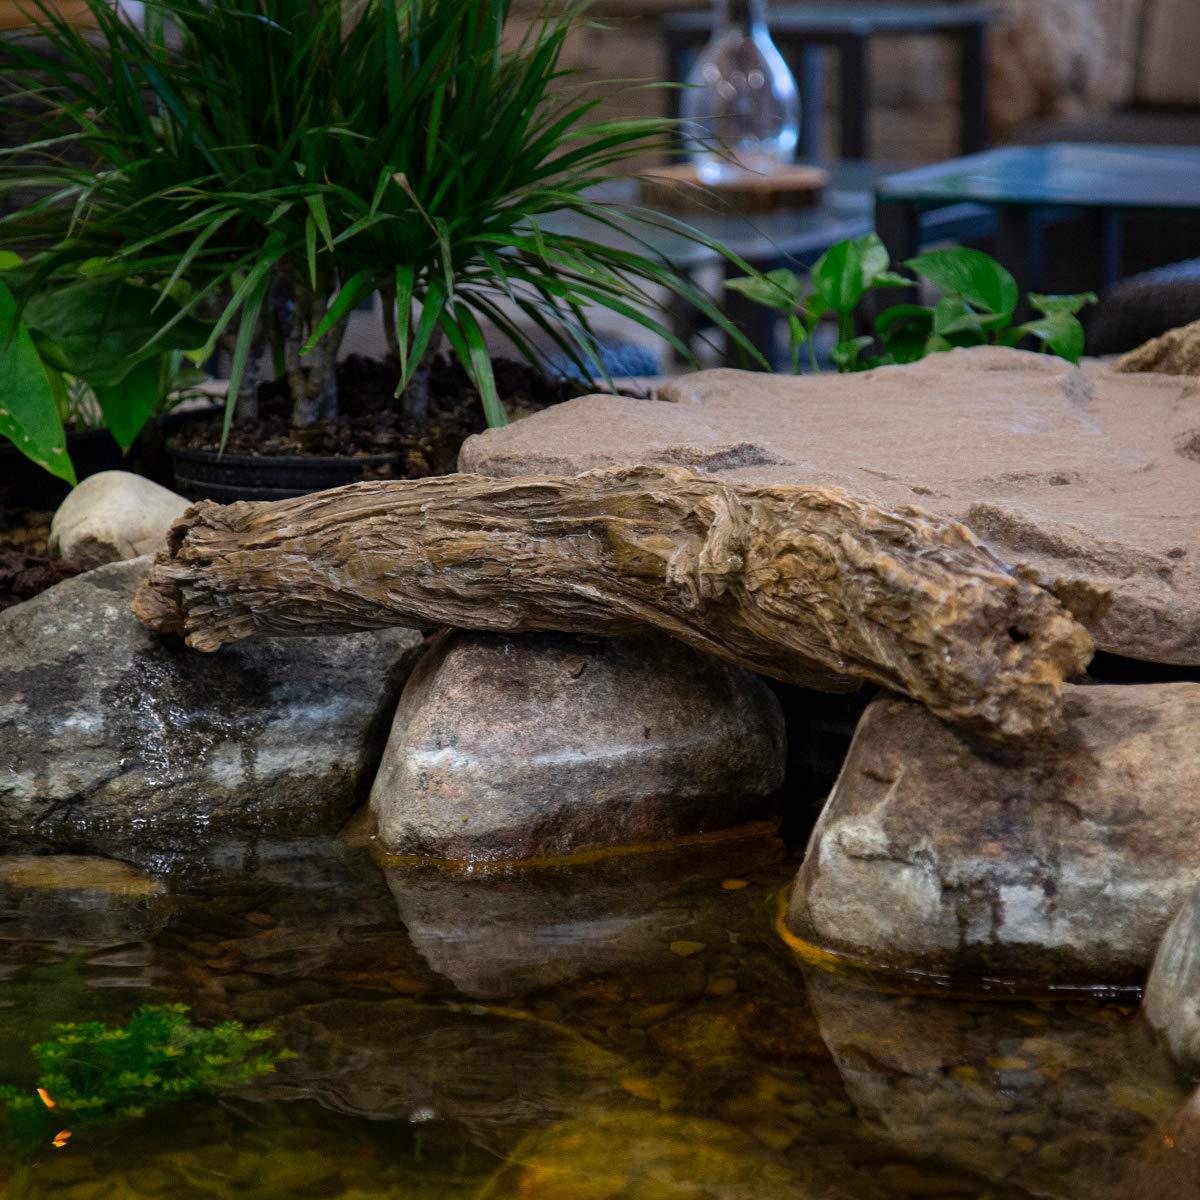 Aquascape 78276 30-inch Faux Driftwood Decorative Accent, Brown